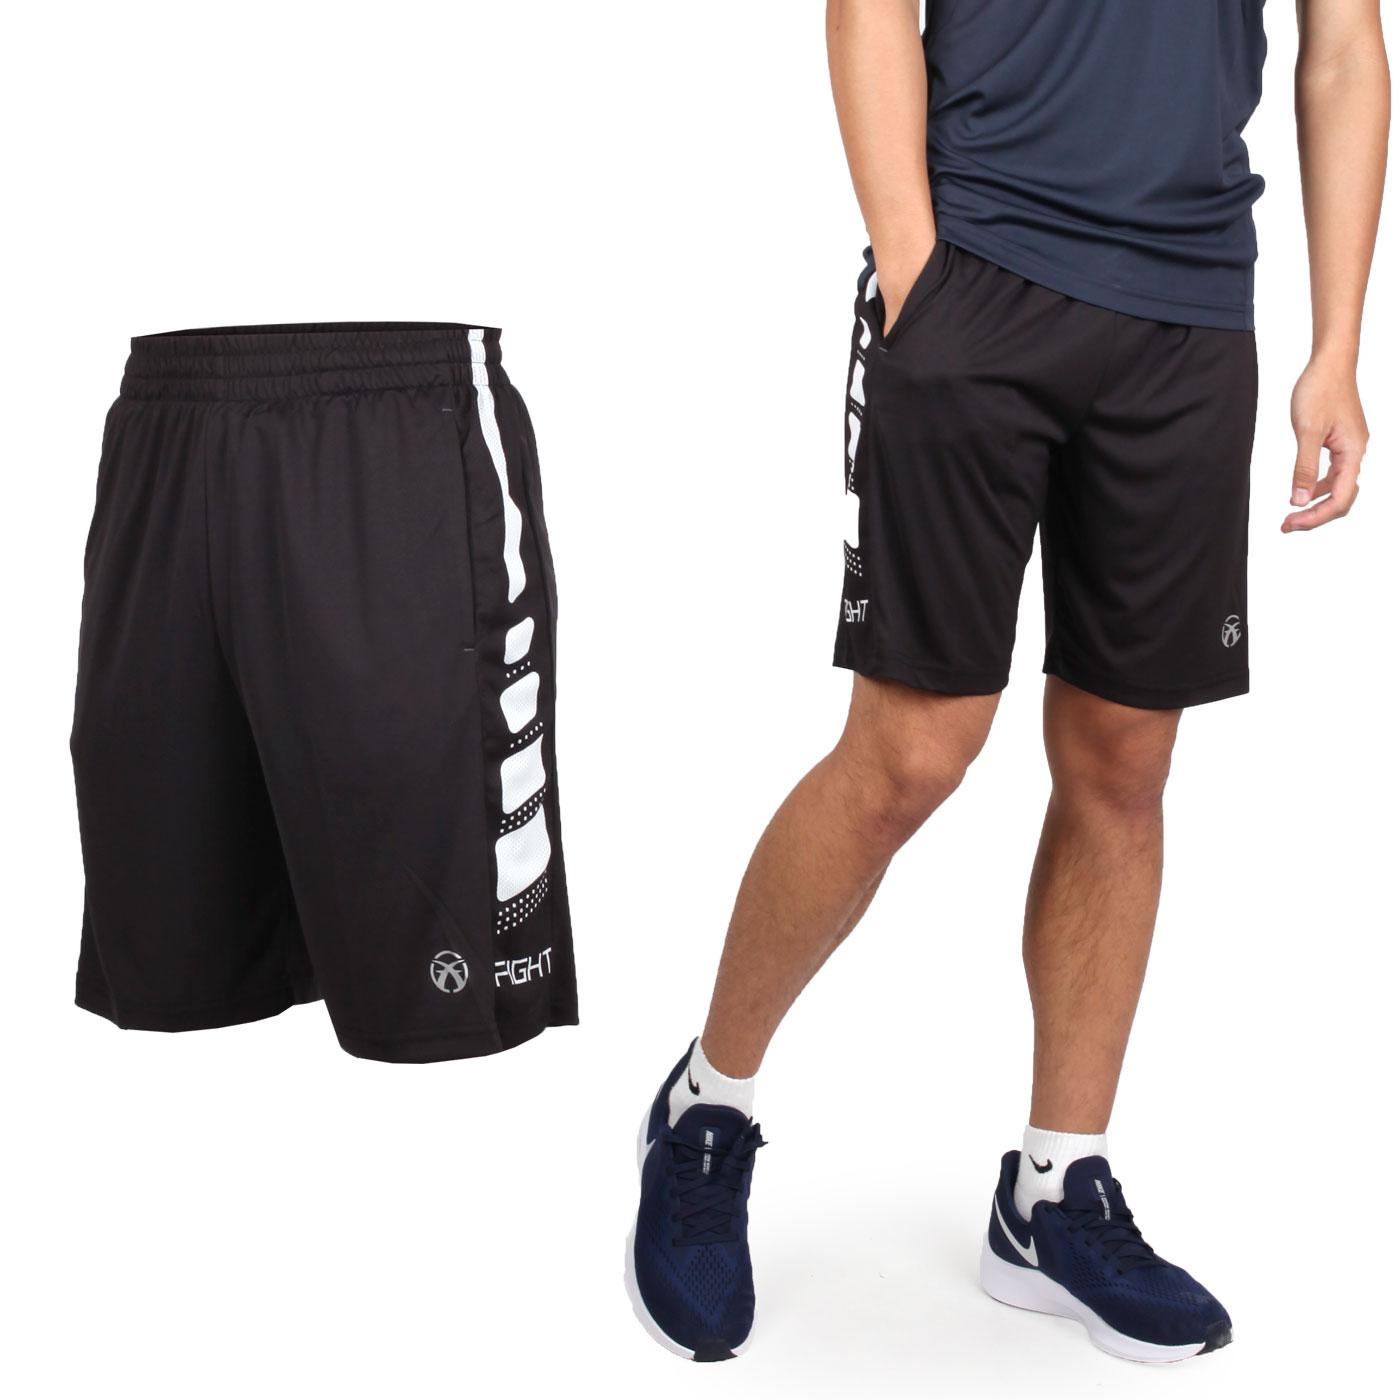 FIRESTAR 男款吸濕排汗籃球短褲 B9201-18 - 黑白